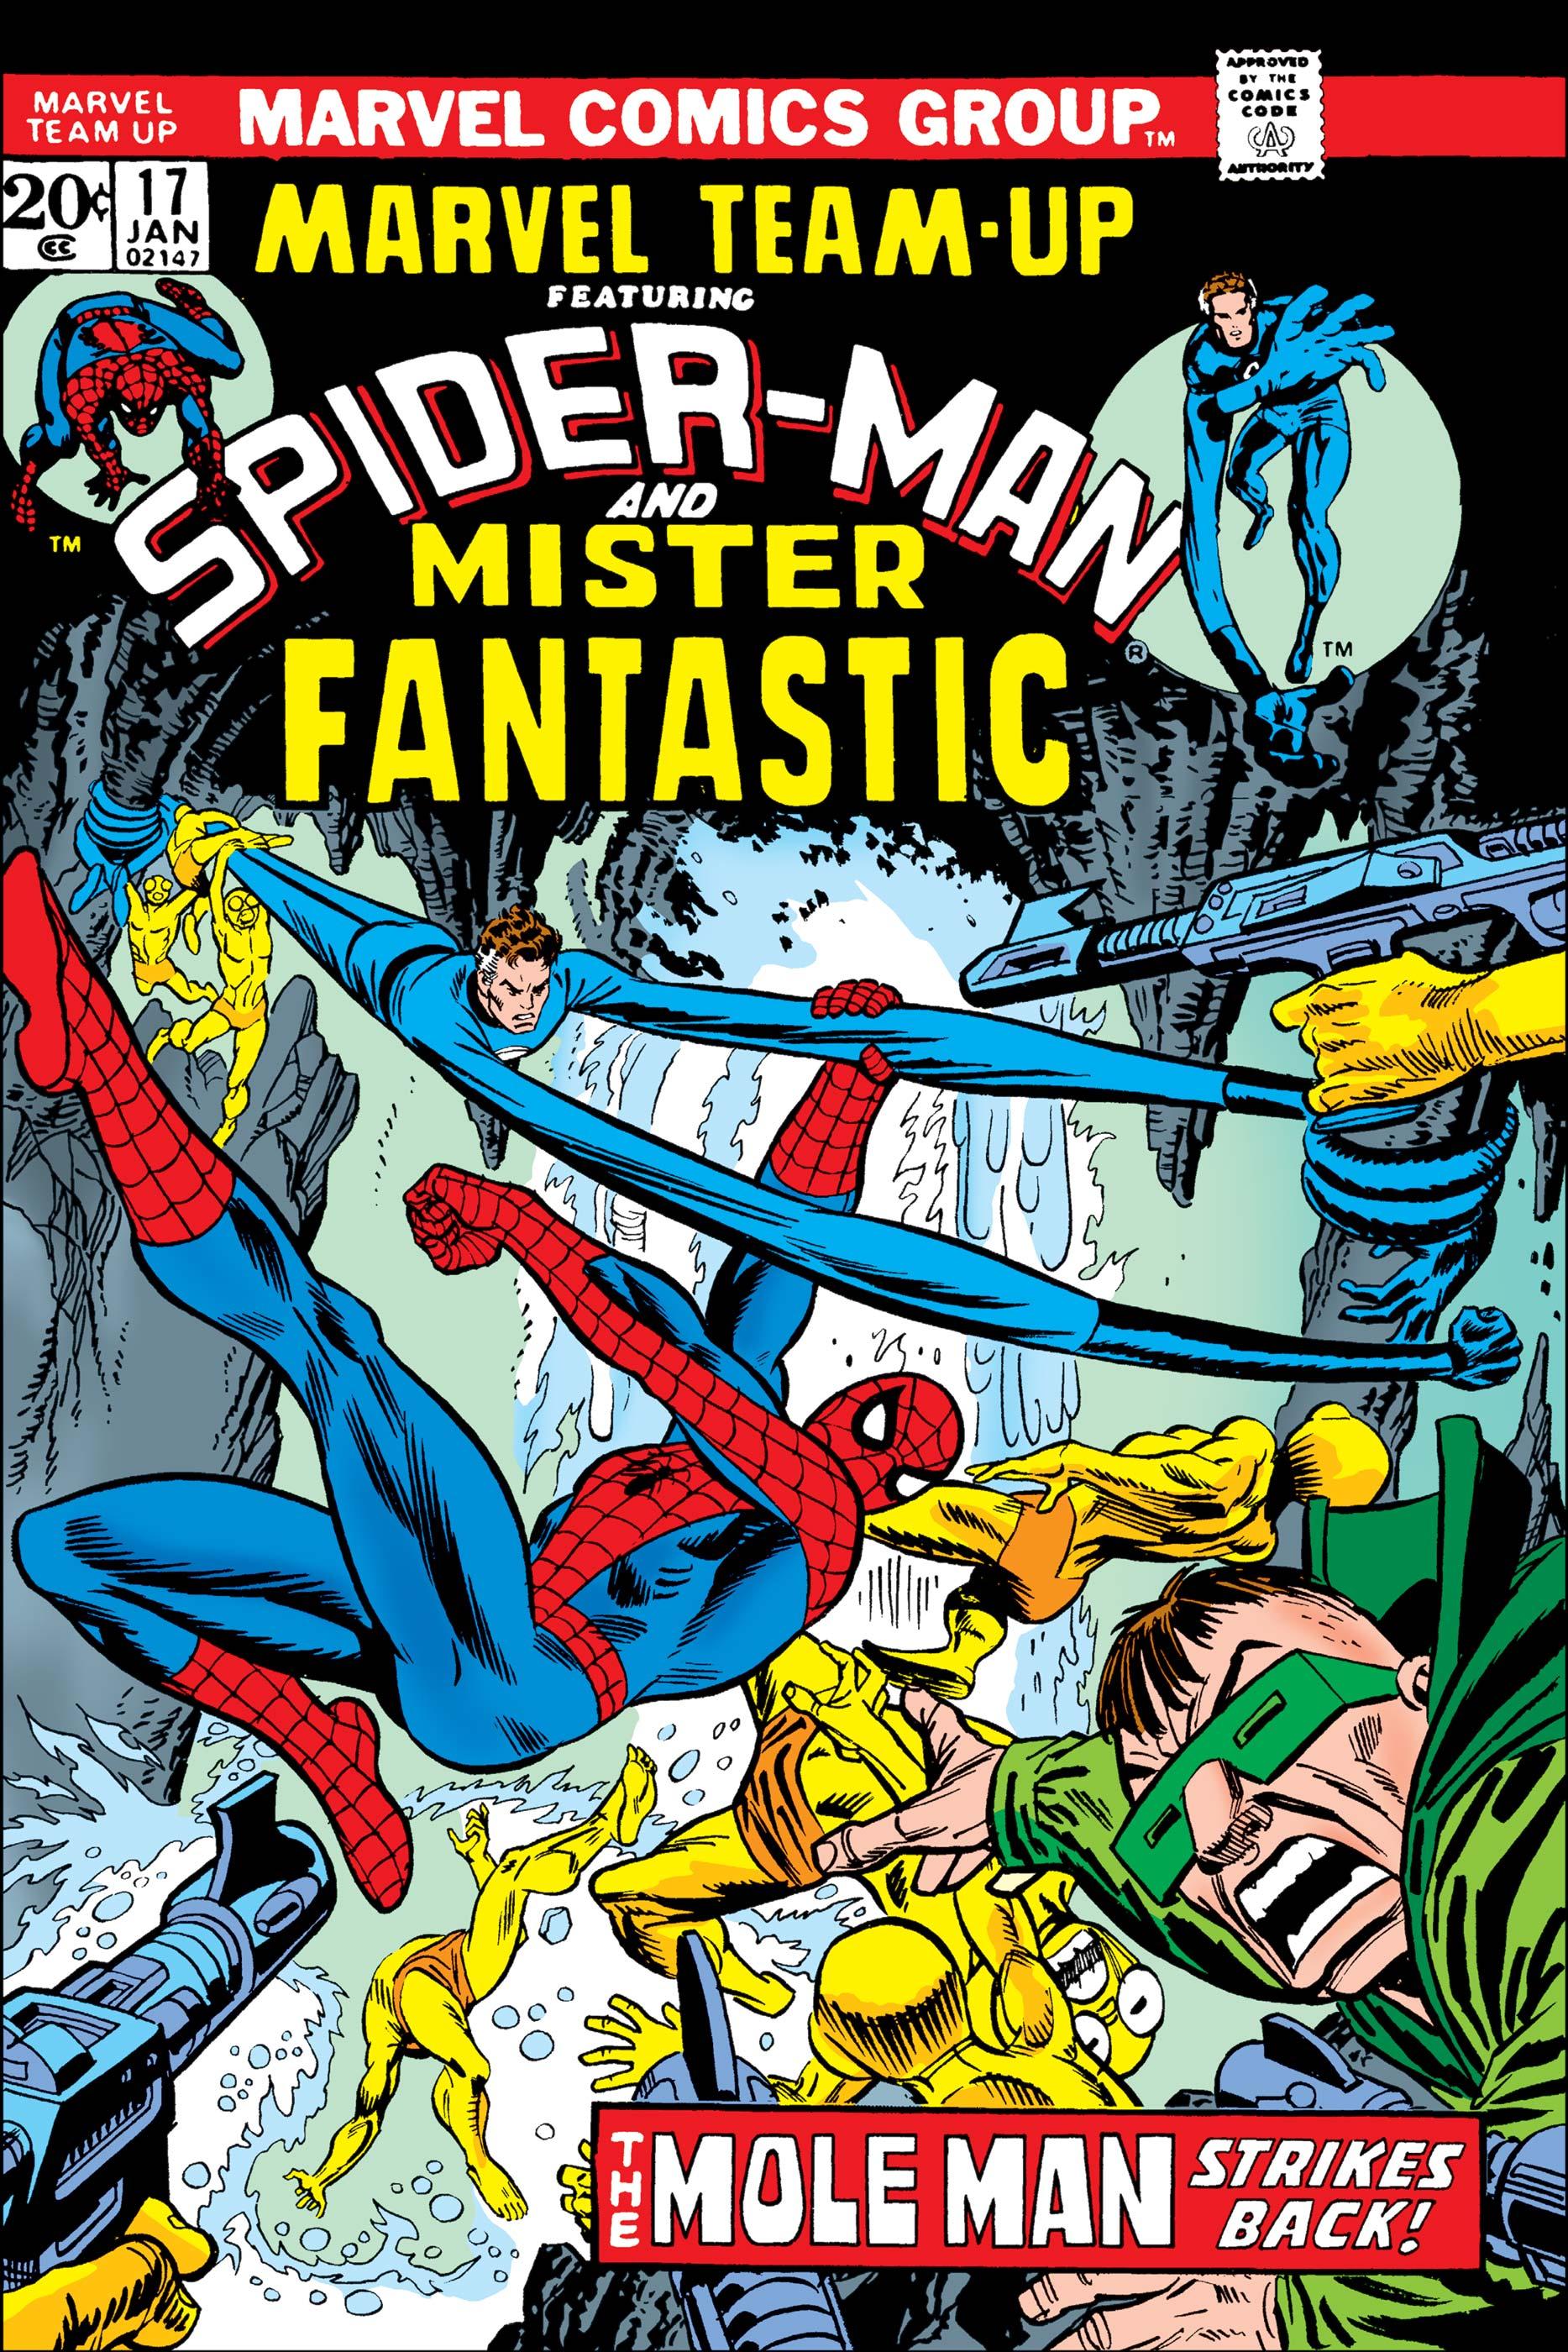 Marvel Team-Up (1972) #17